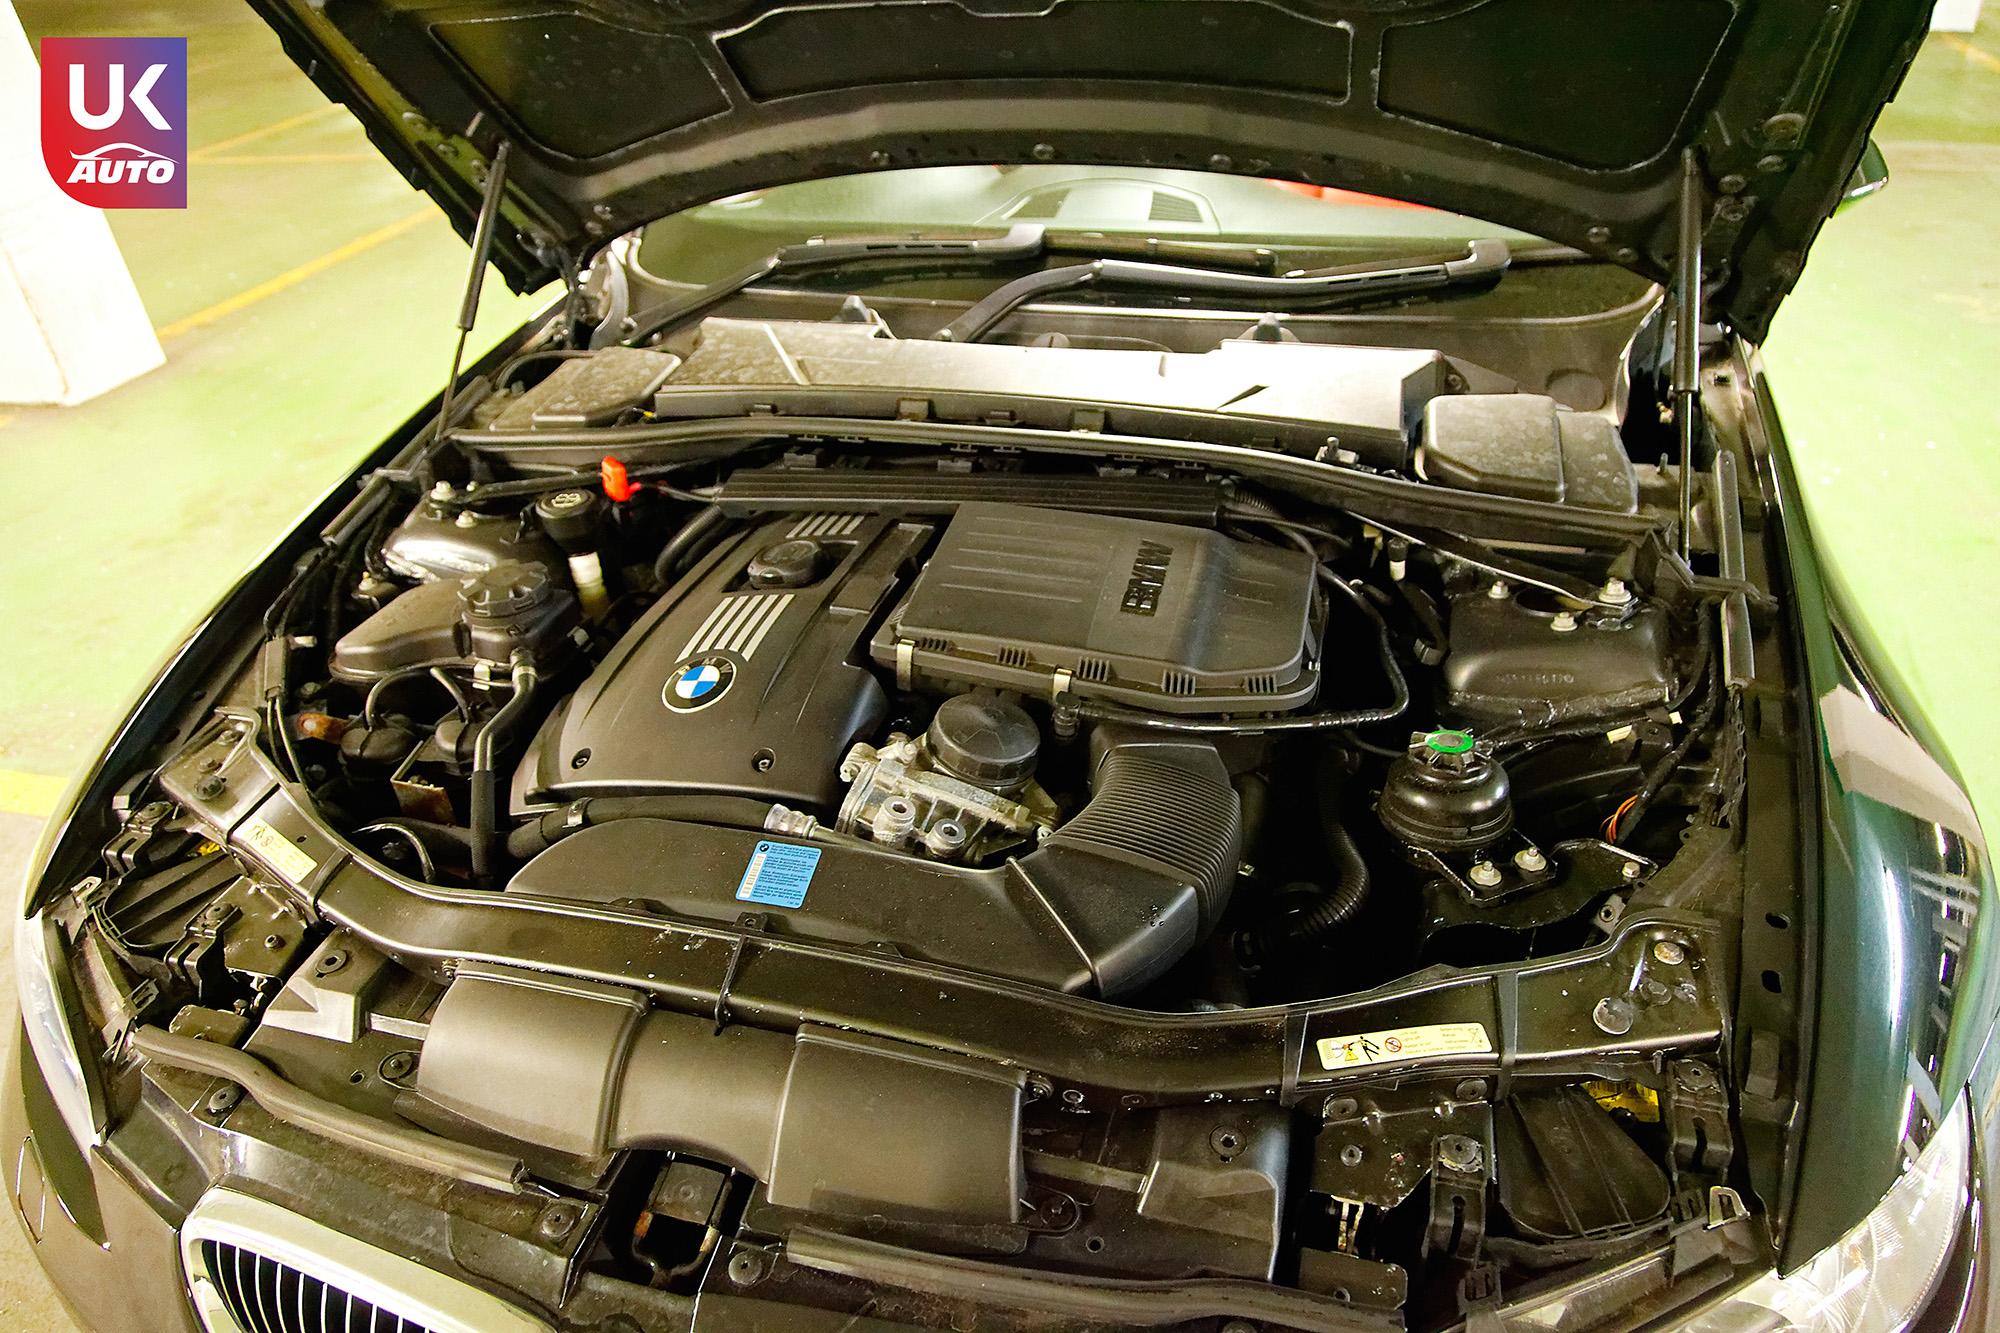 UKAUTO IMPORT ANGLETERRE BMW 335i CABRIOLET UKA RHD58 - Felecitation a Jeremie pour cette BMW 335i cabriolet RHD PACK M IMPORT AUTO ANGLAISE